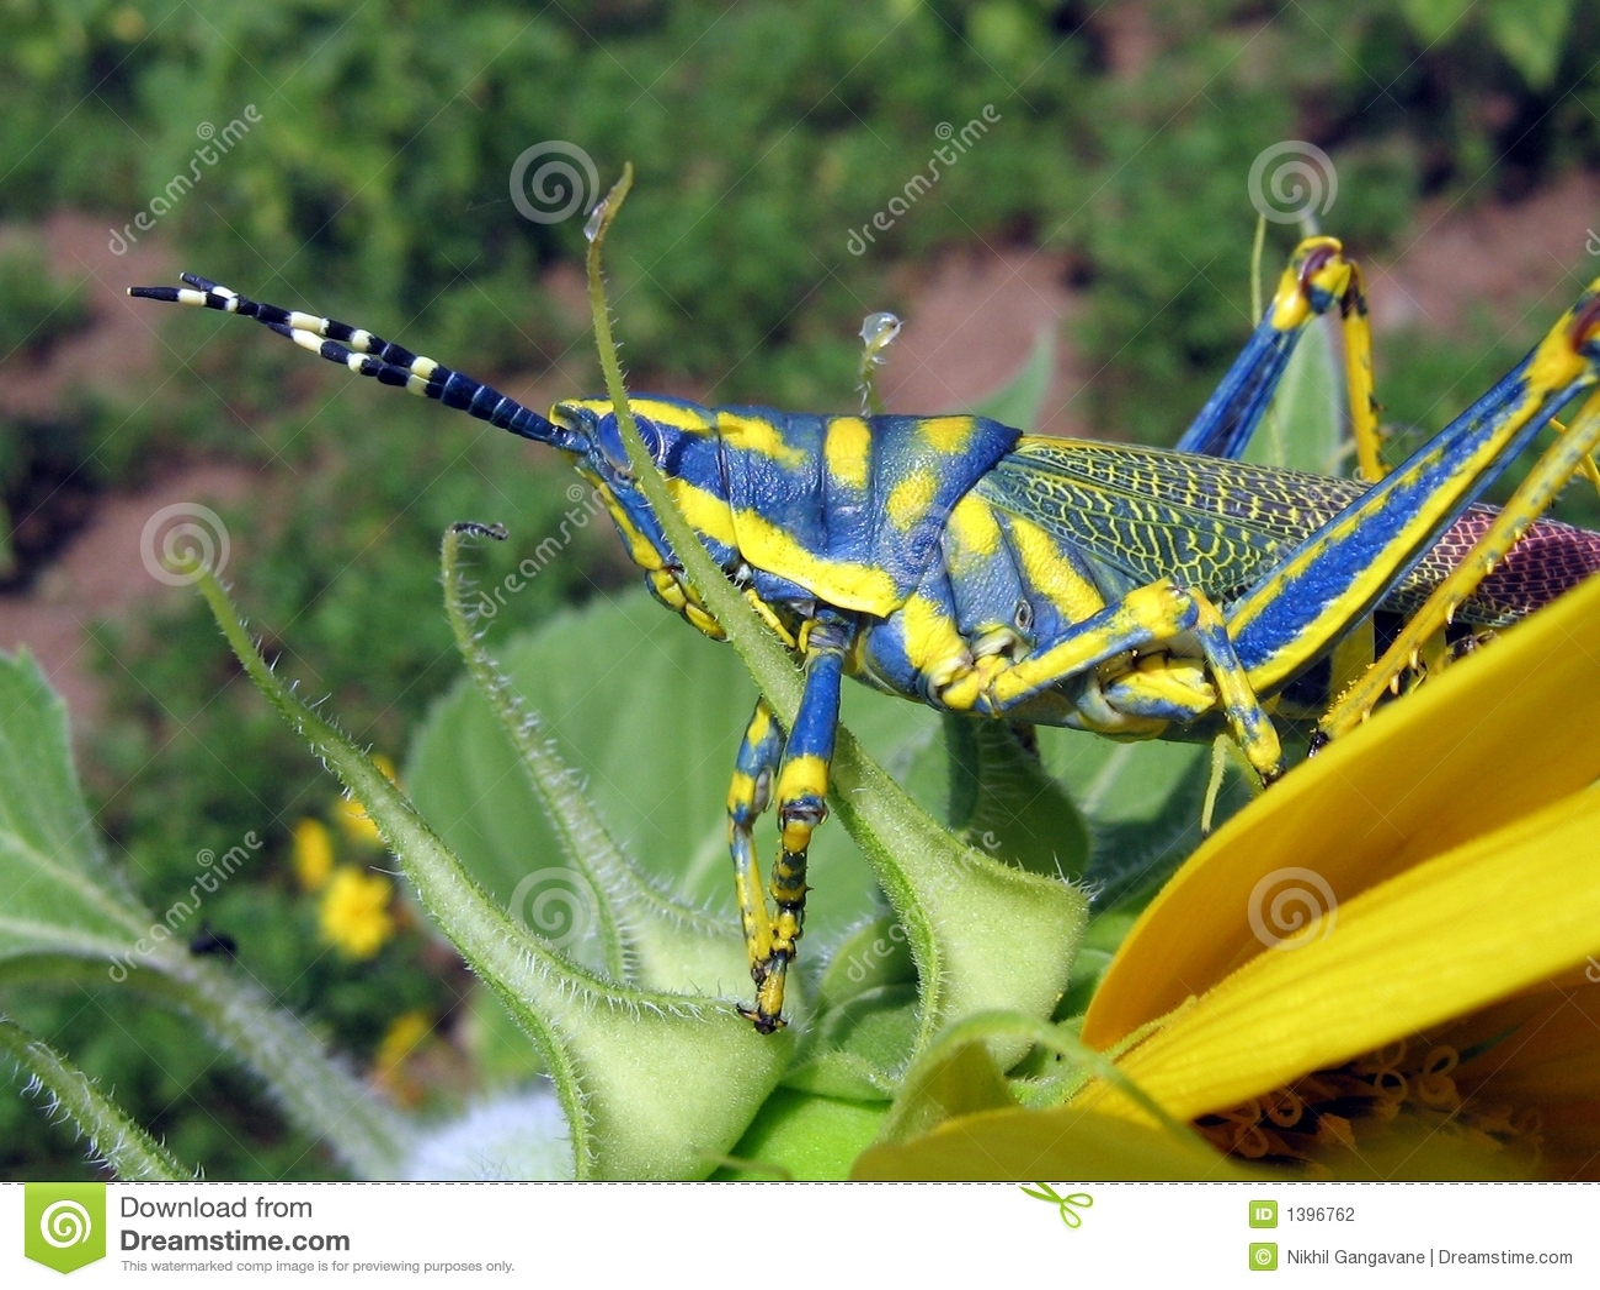 Hanging Grasshopper